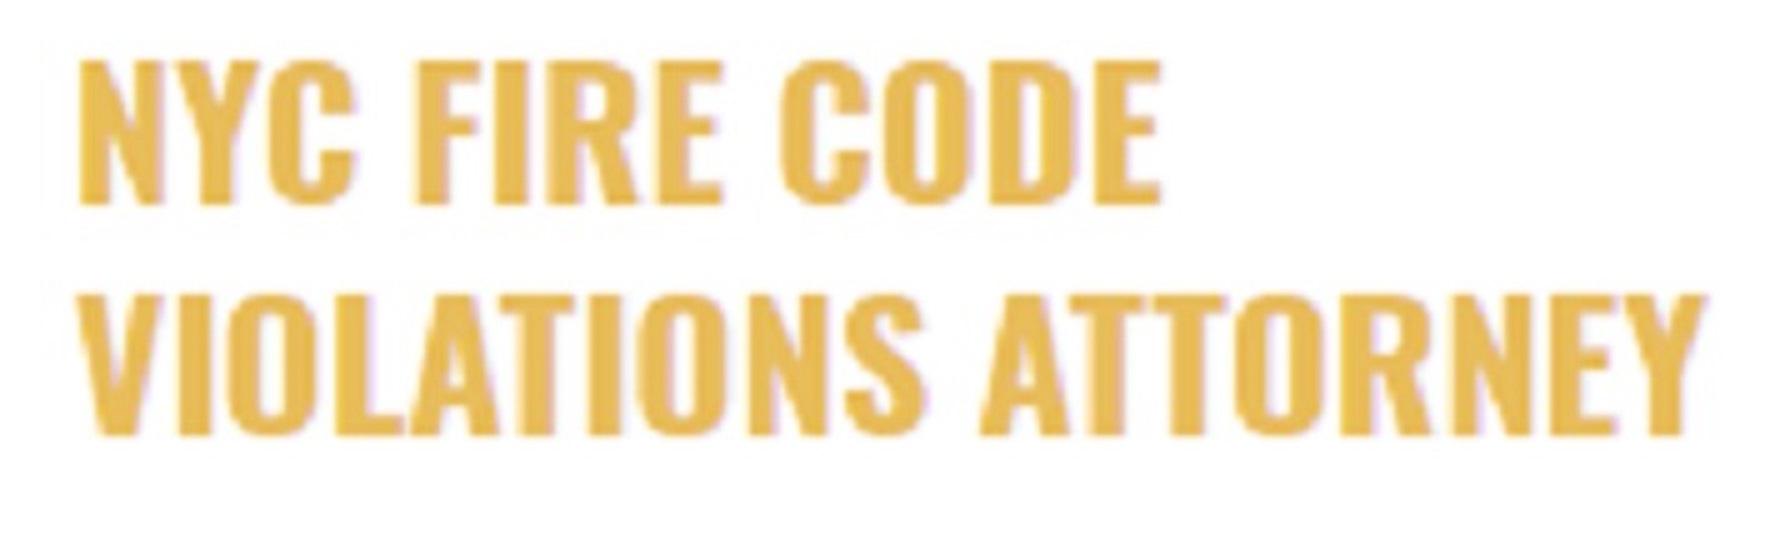 fire-code-violations